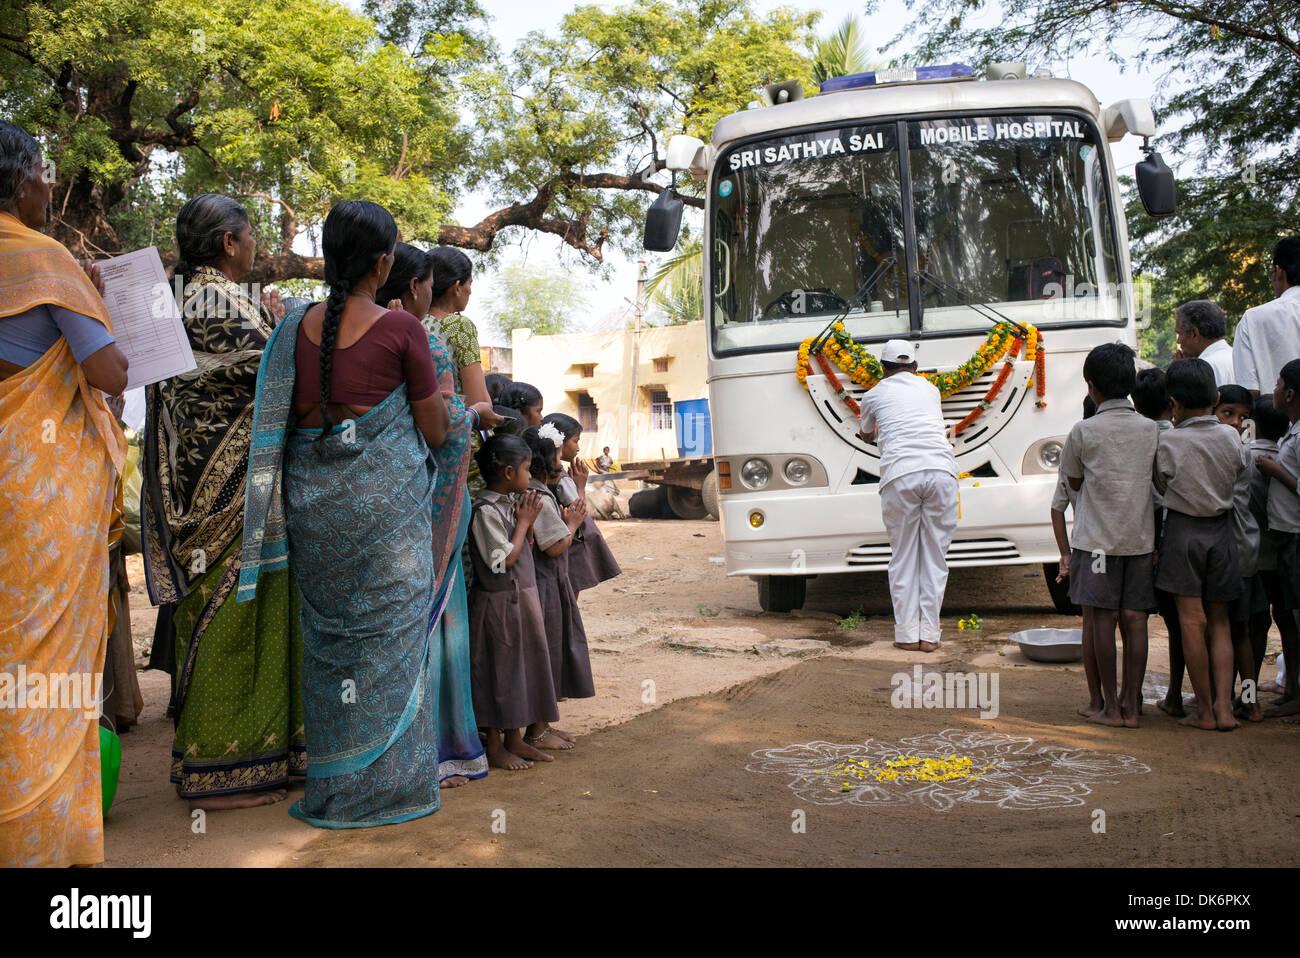 Sri Sathya Sai Baba mobile outreach hospital service clinic bus at a